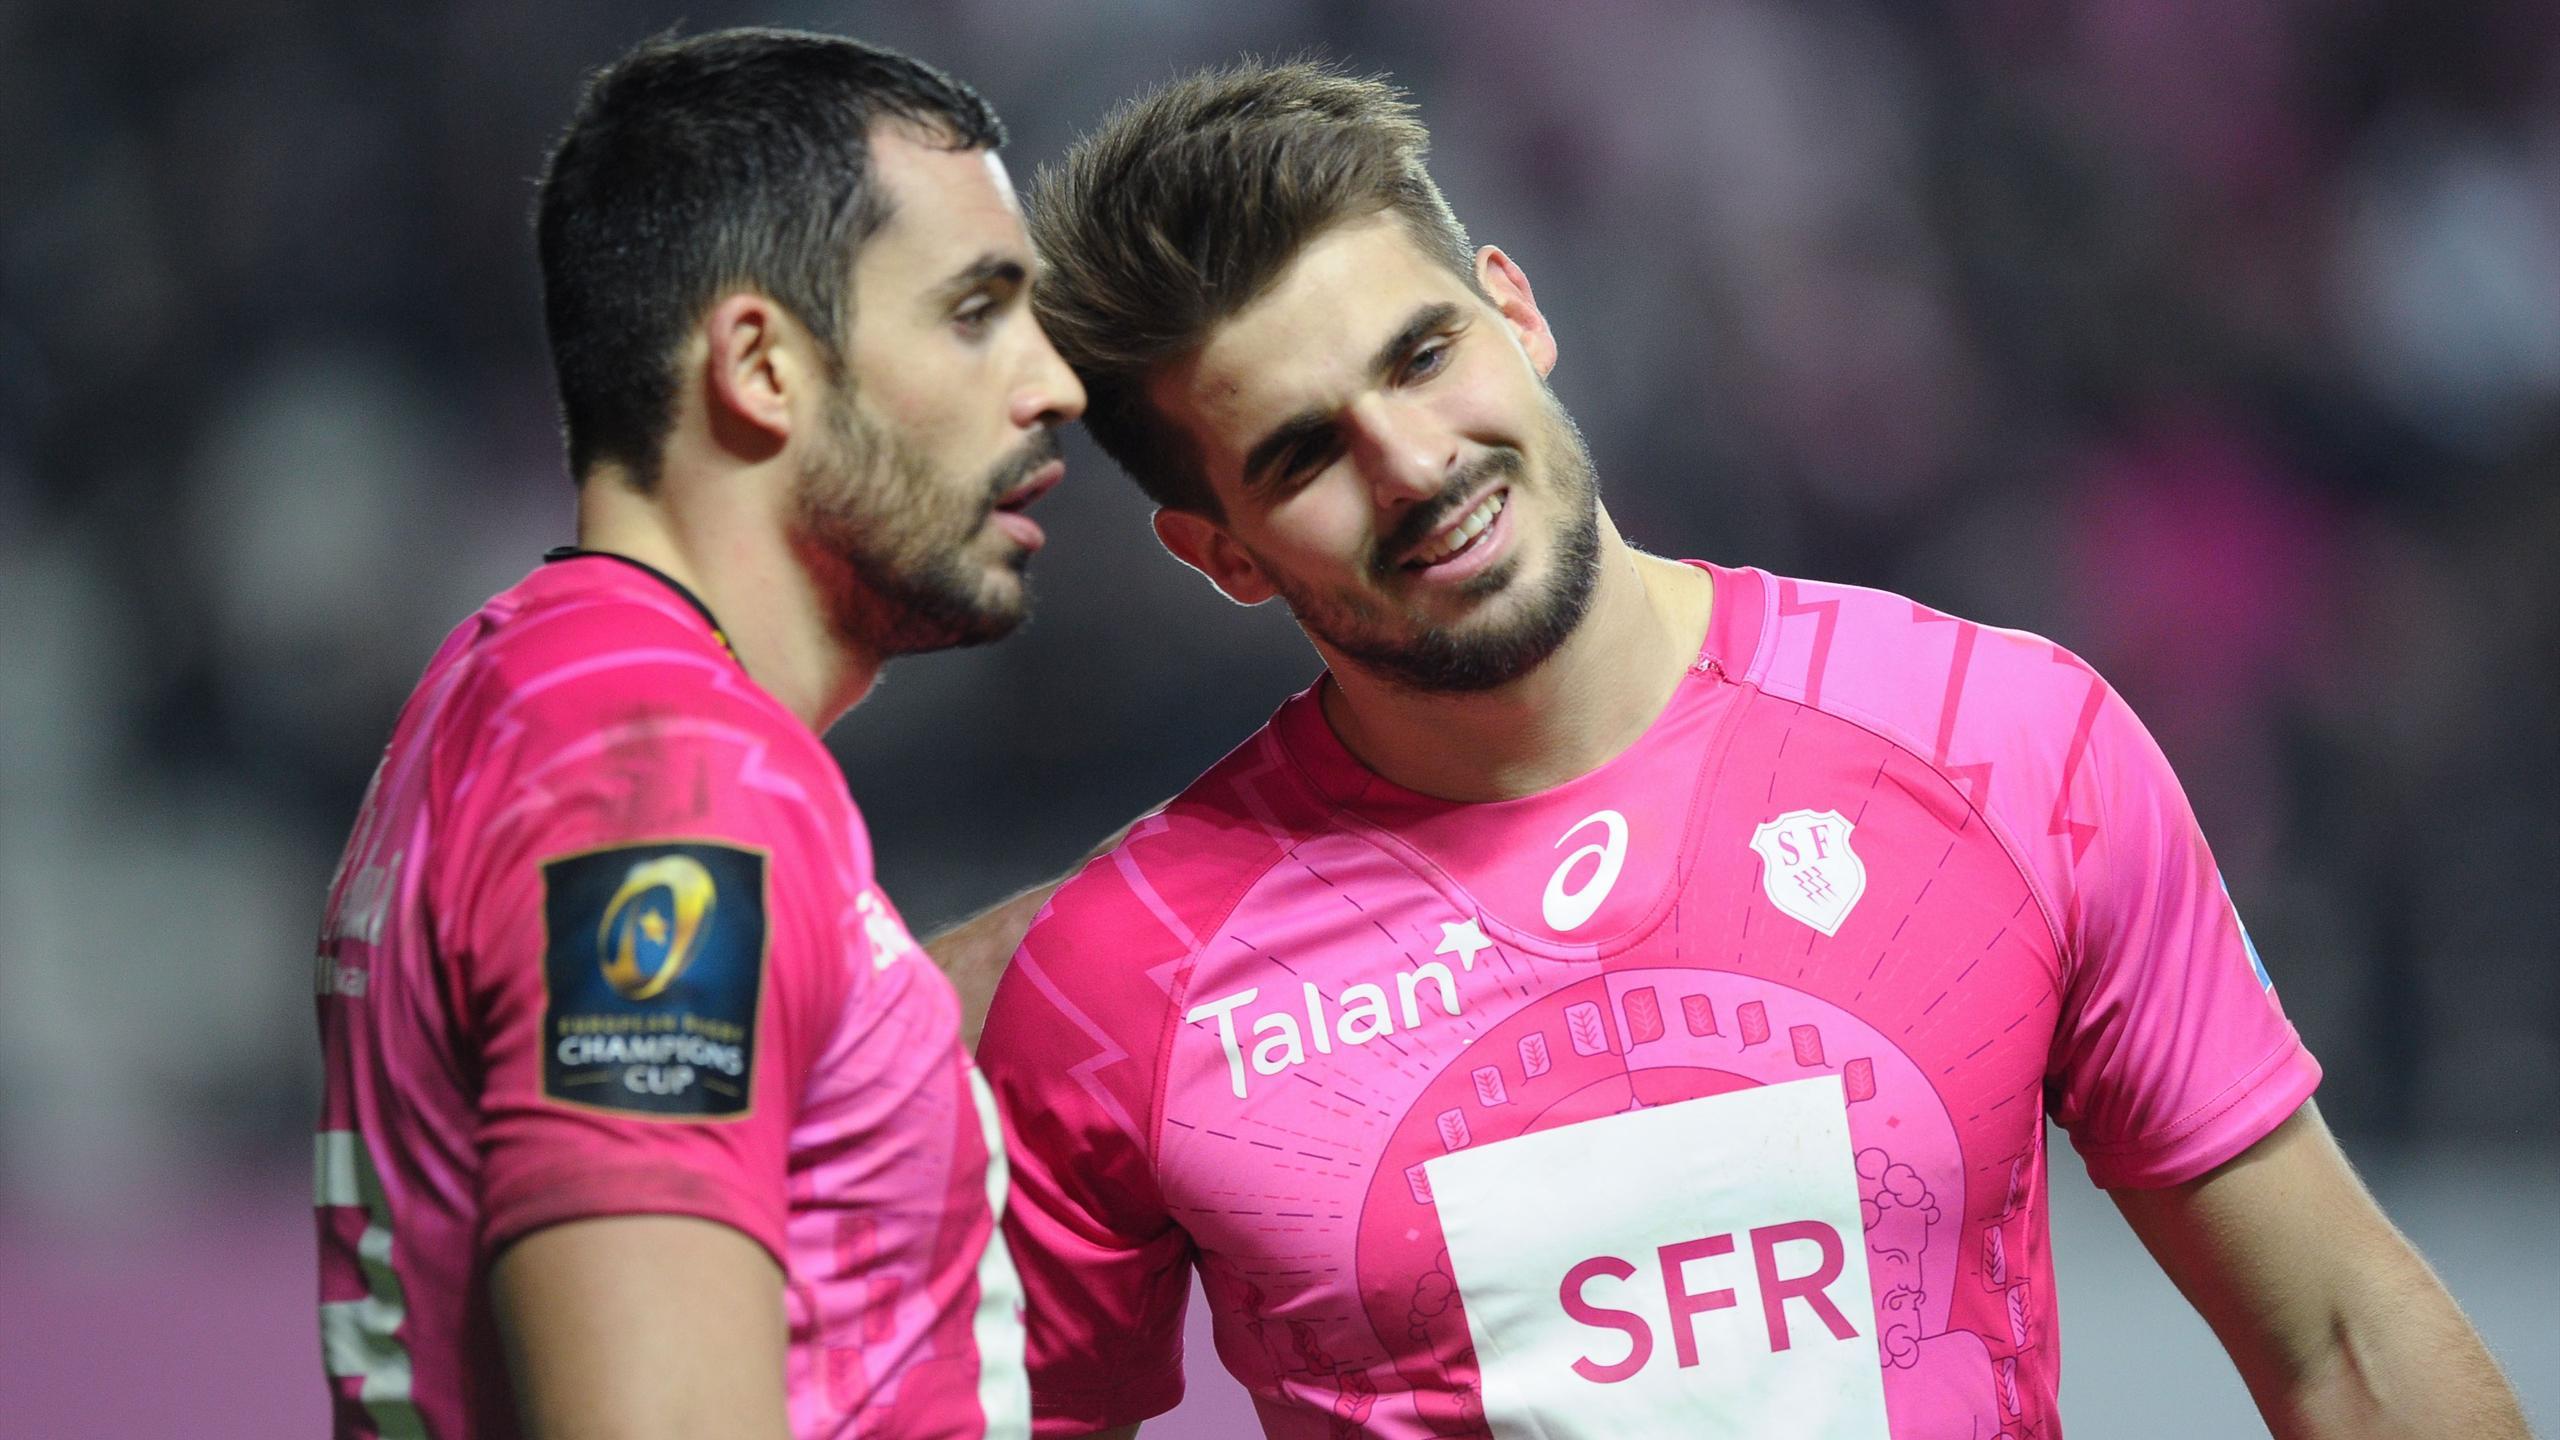 Geoffrey Doumayrou et Hugo Bonneval (Stade français) - 19 décembre 2015